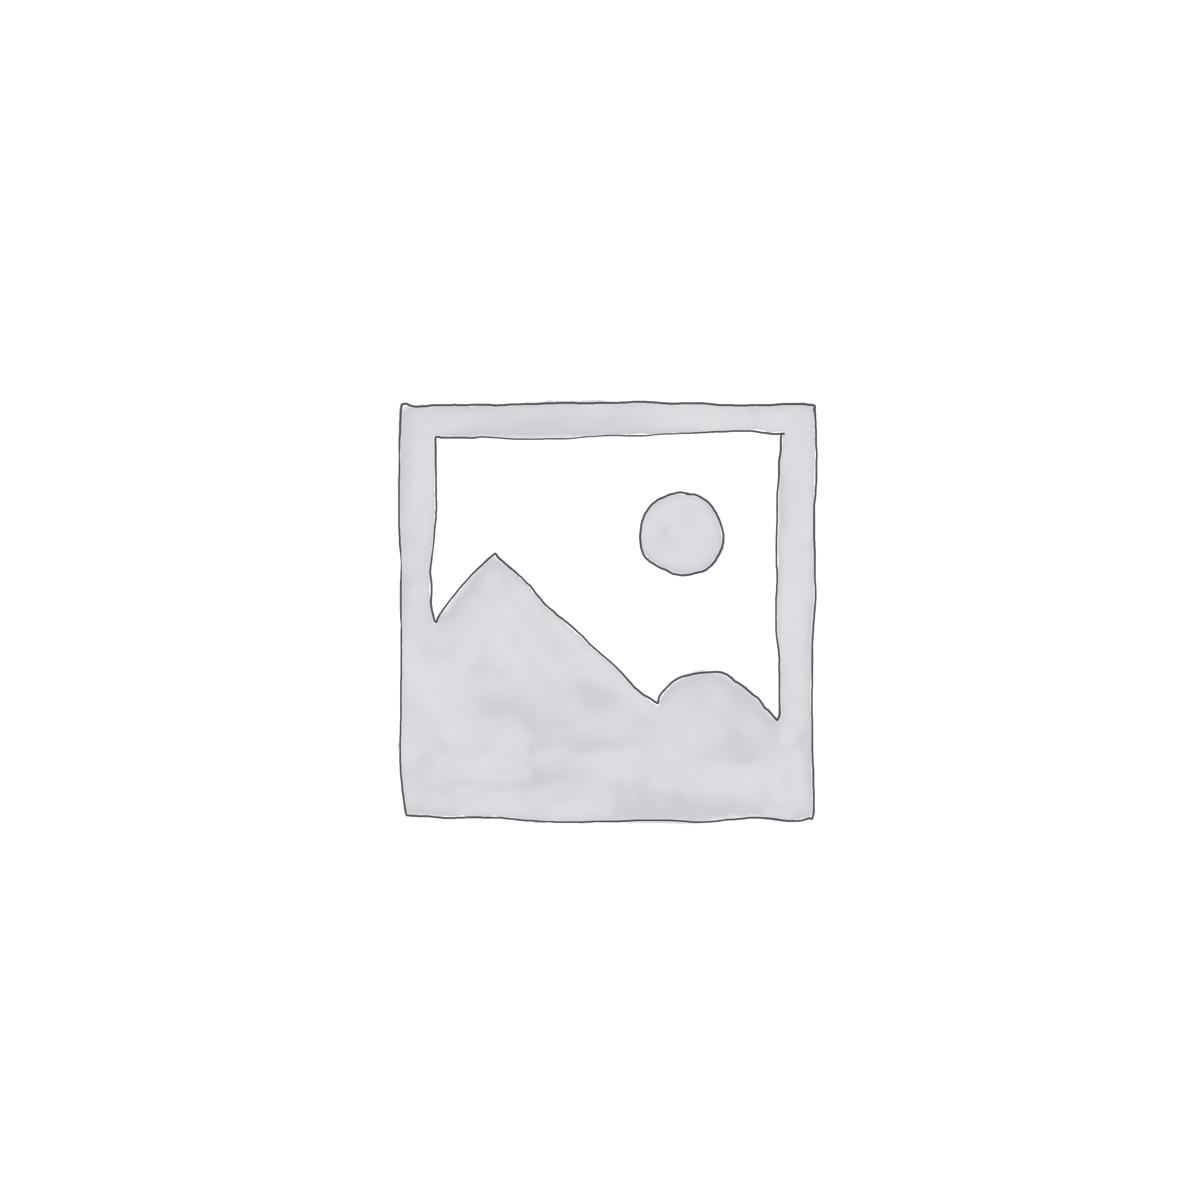 Cartoon Slackline with Animals Wallpaper Mural